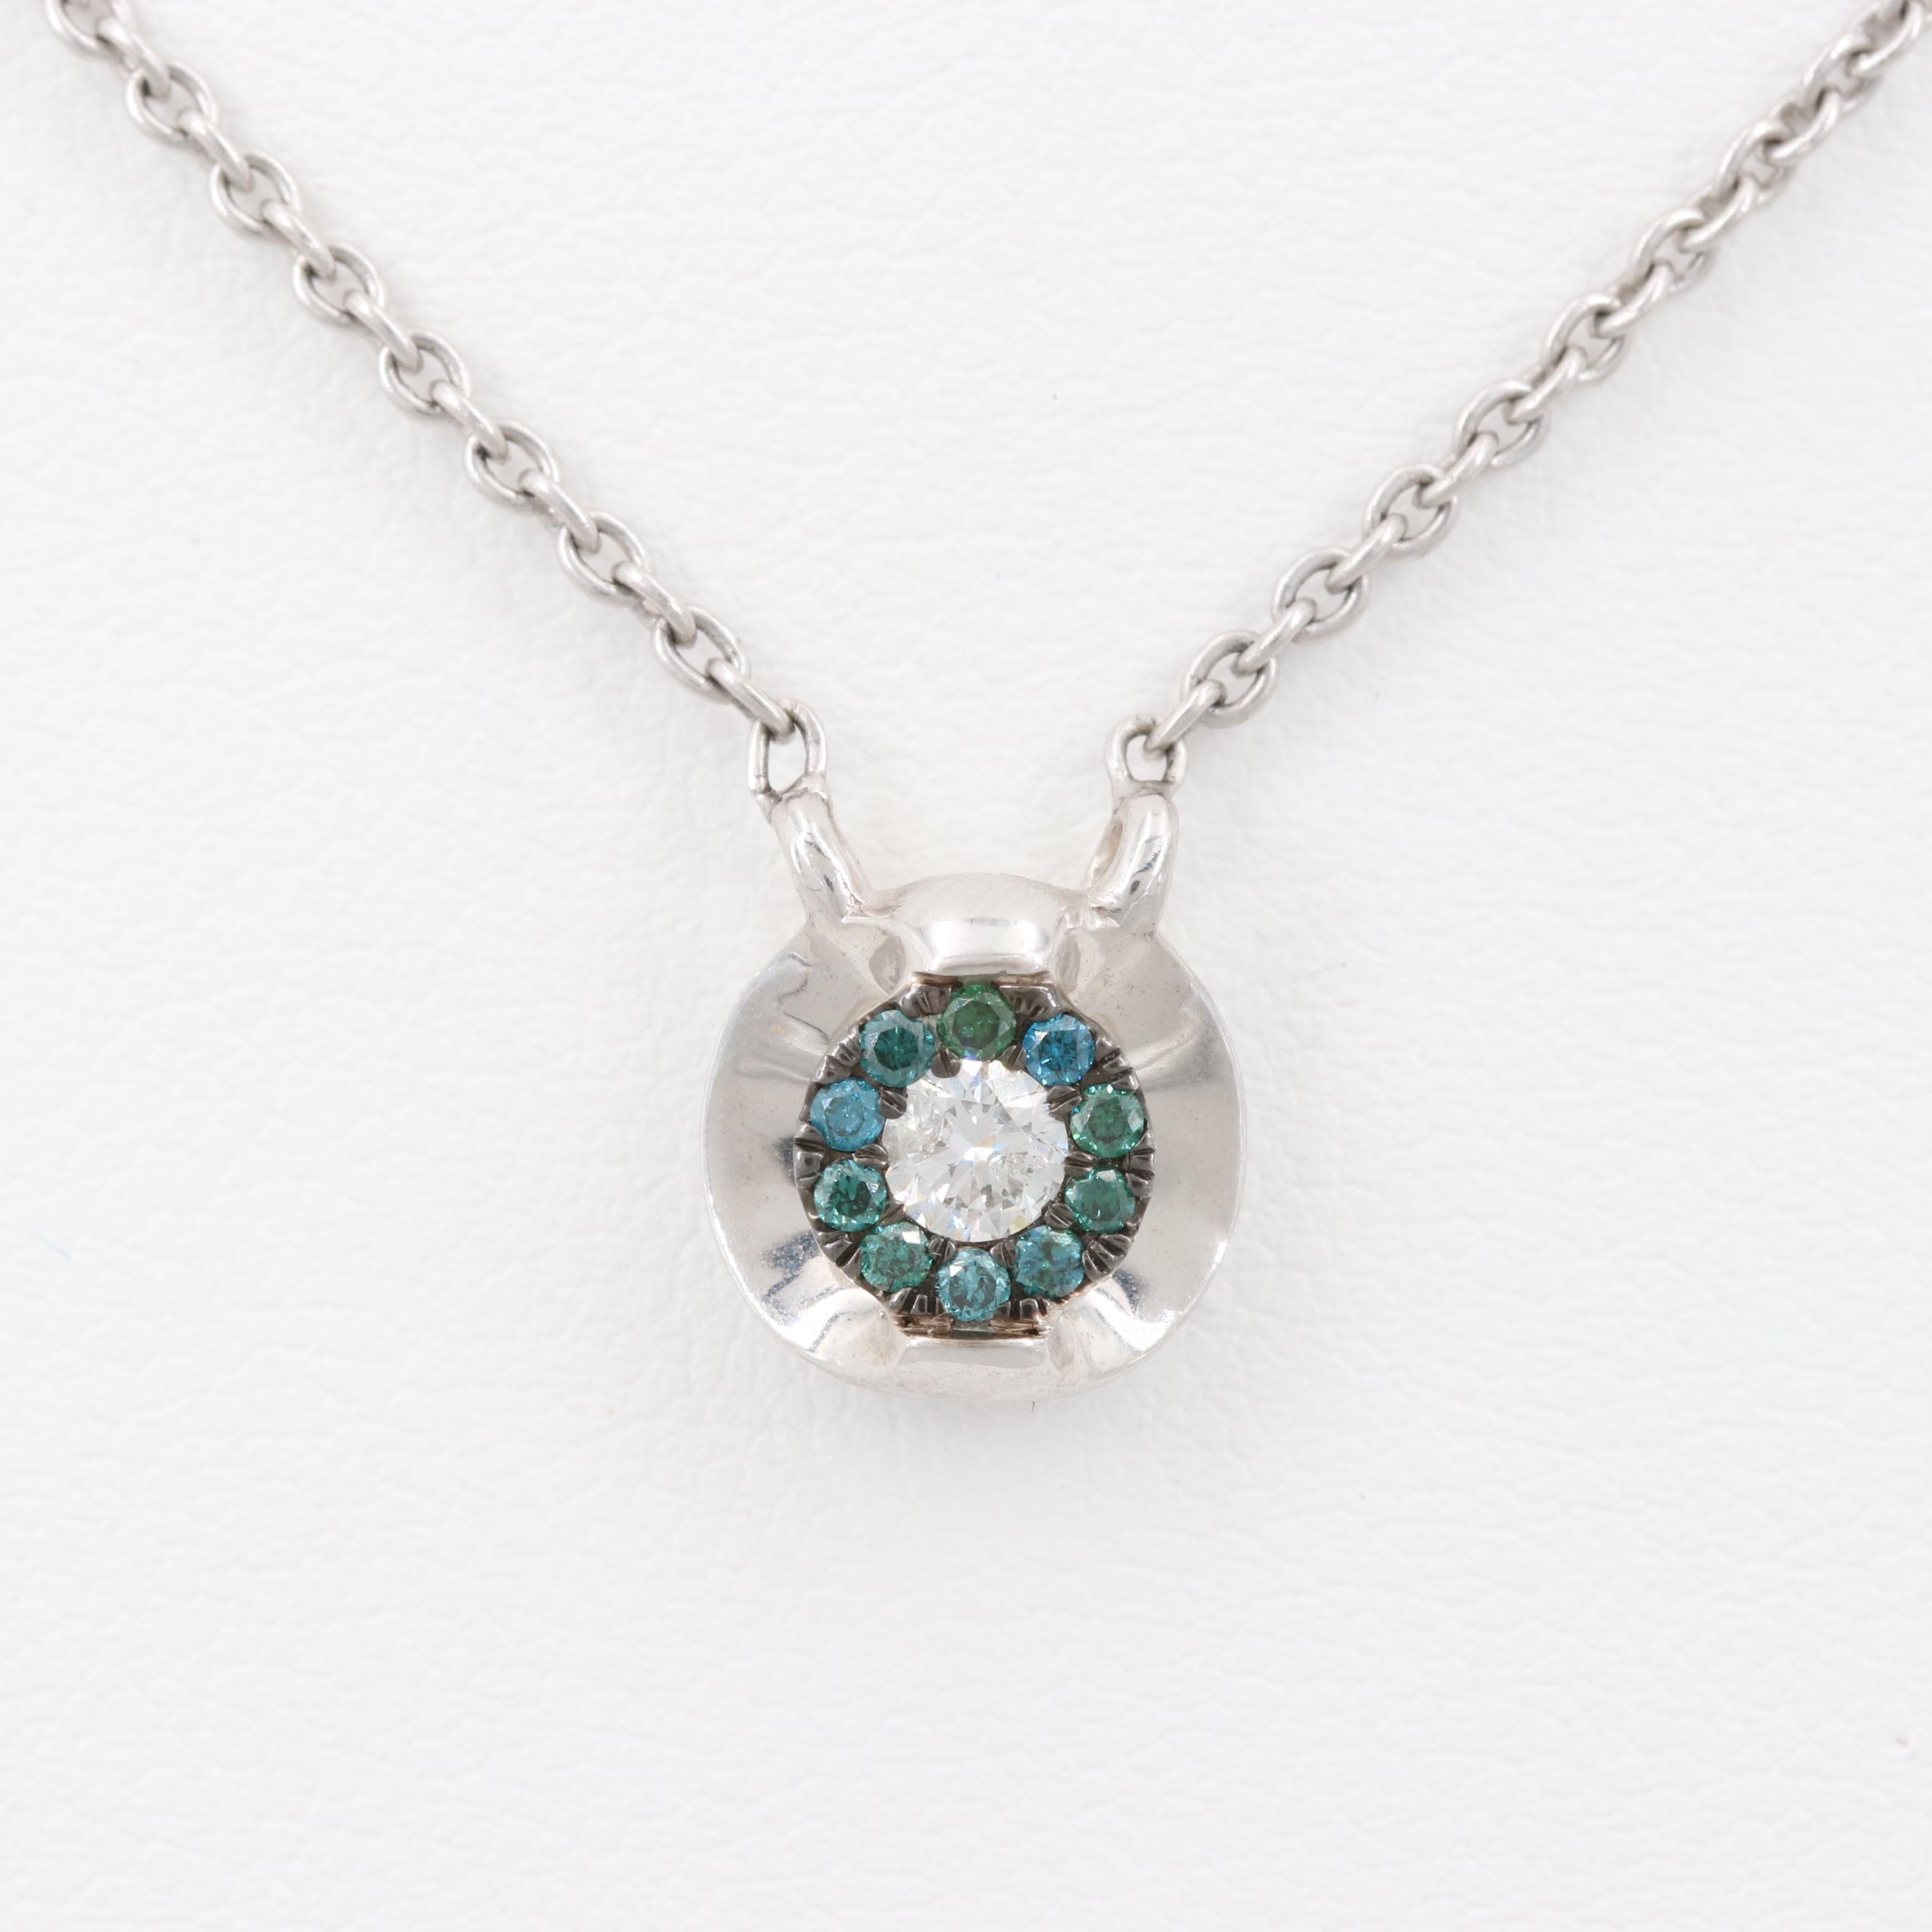 14K and 18K White Gold Diamond Pendant Necklace